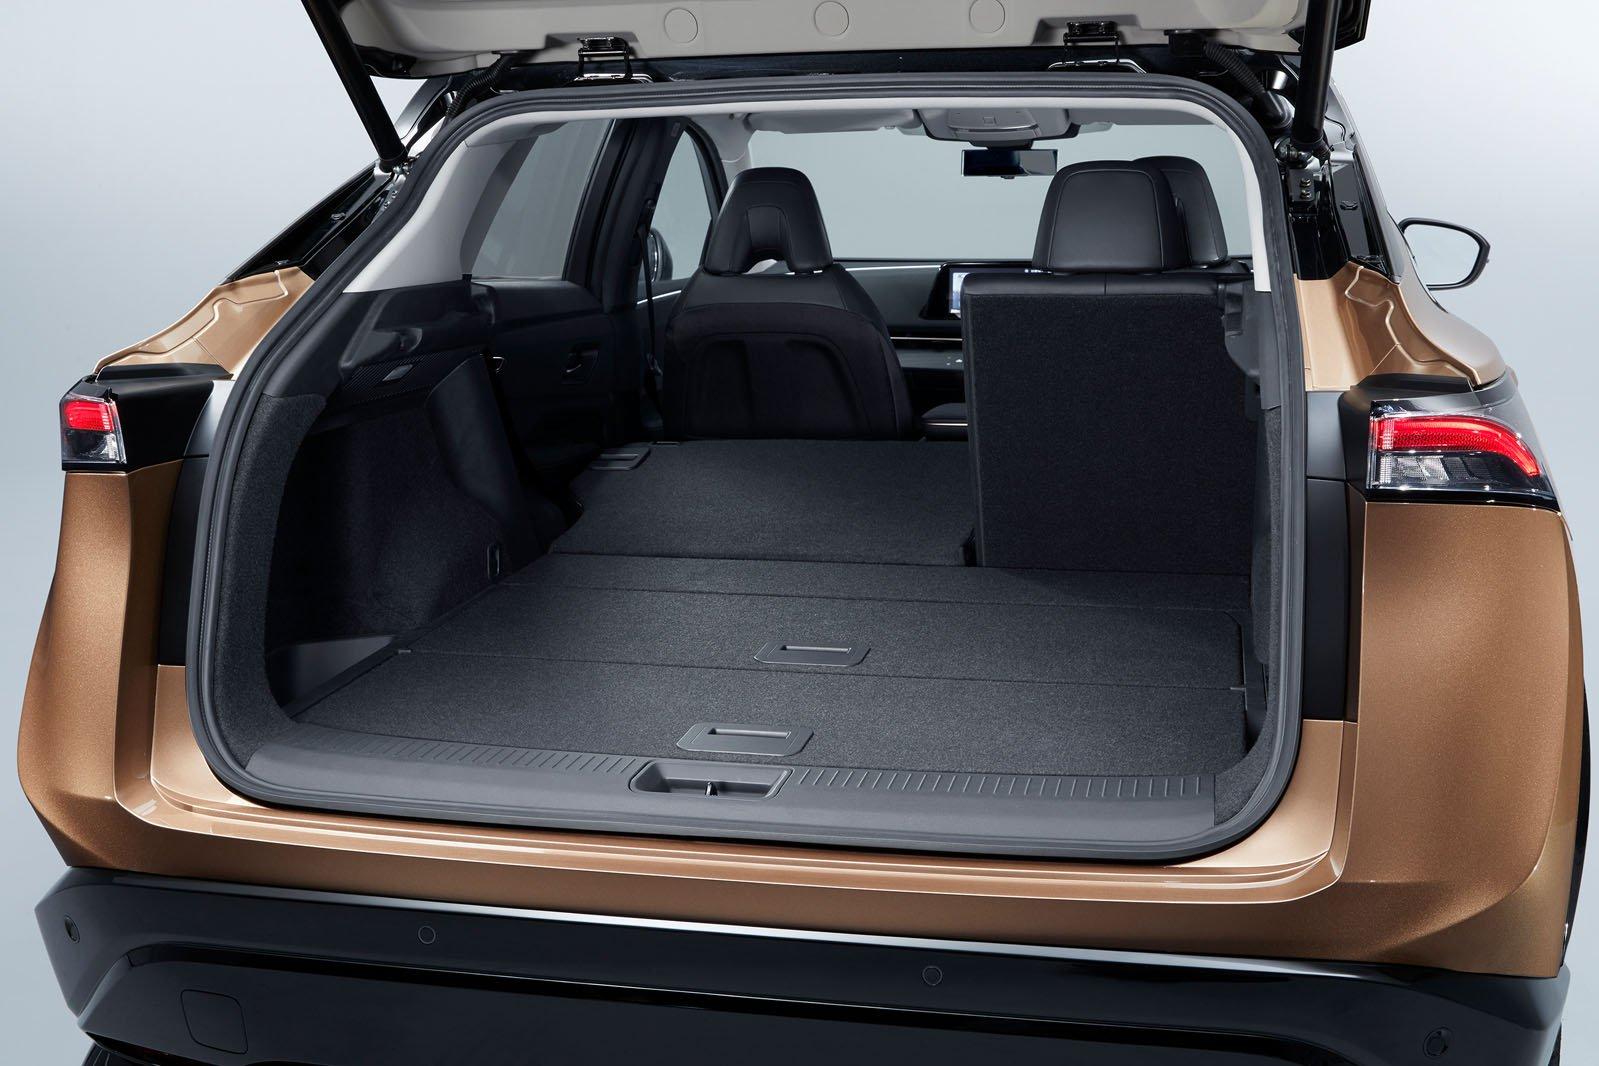 2021 Nissan Ariya boot